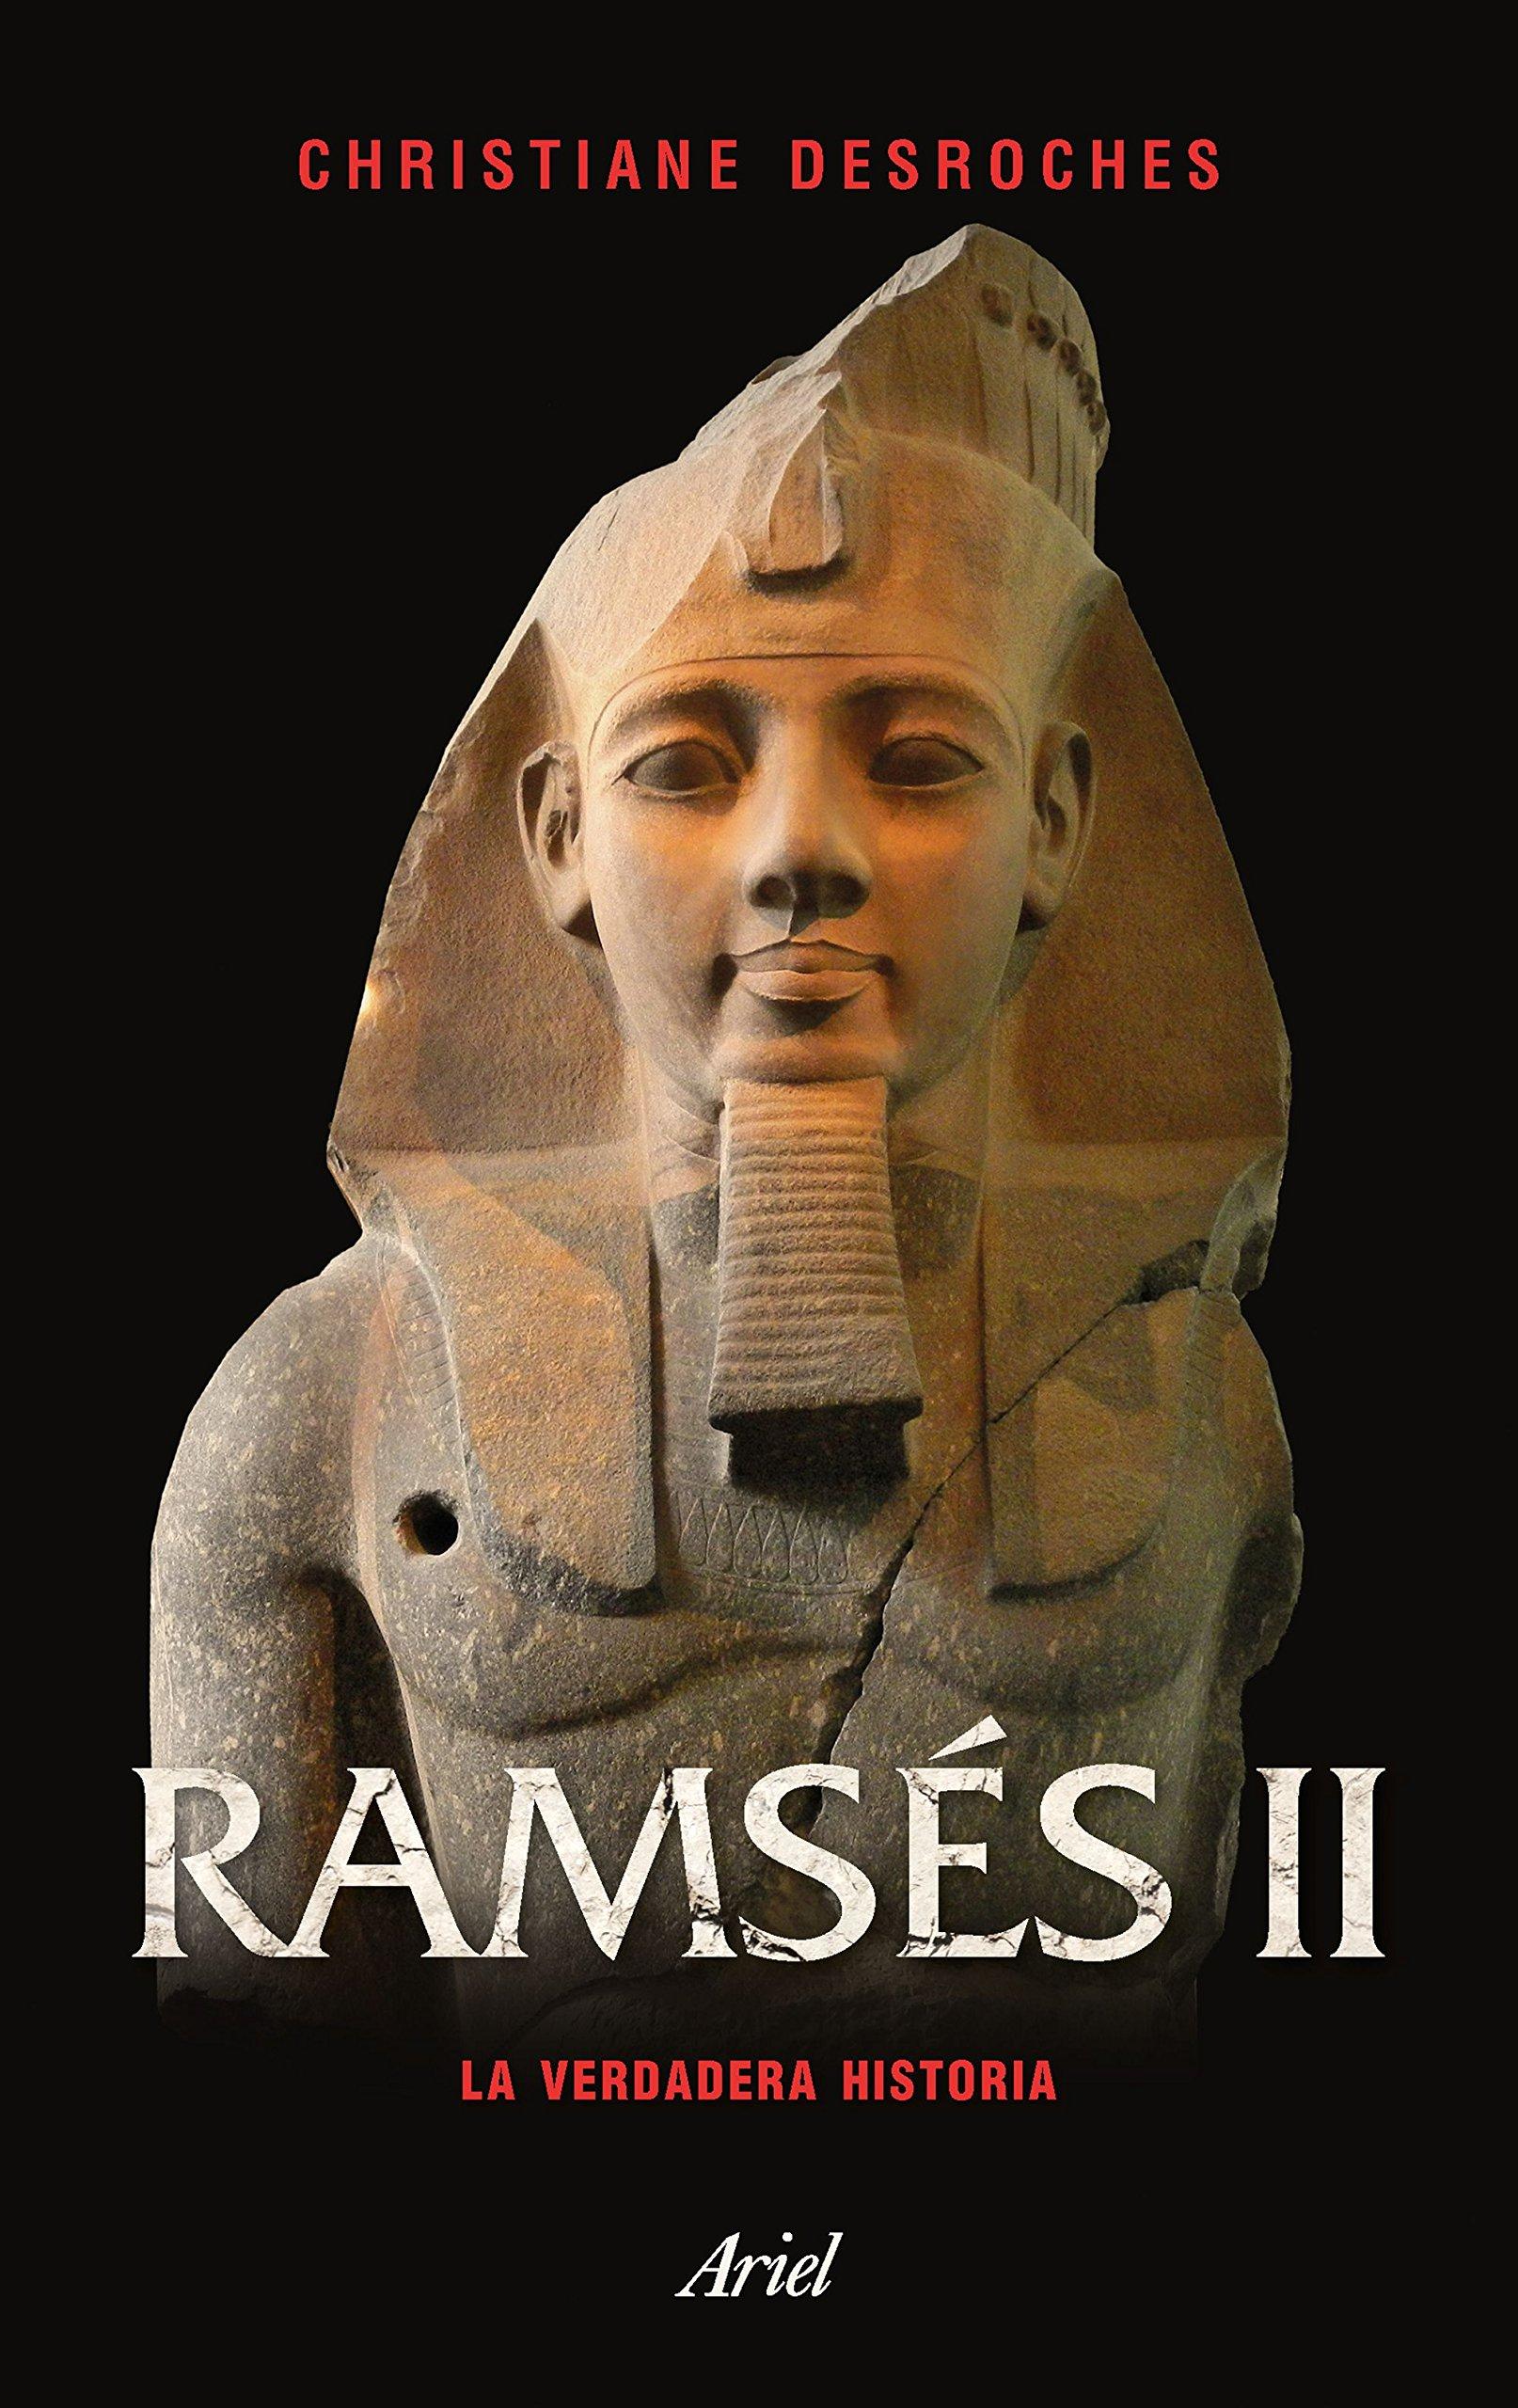 Ramsés II: La verdadera historia (Ariel) Tapa blanda – 6 feb 2018 Juana Bignozzi Editorial Ariel 8434427338 Ancient history: to c 500 CE